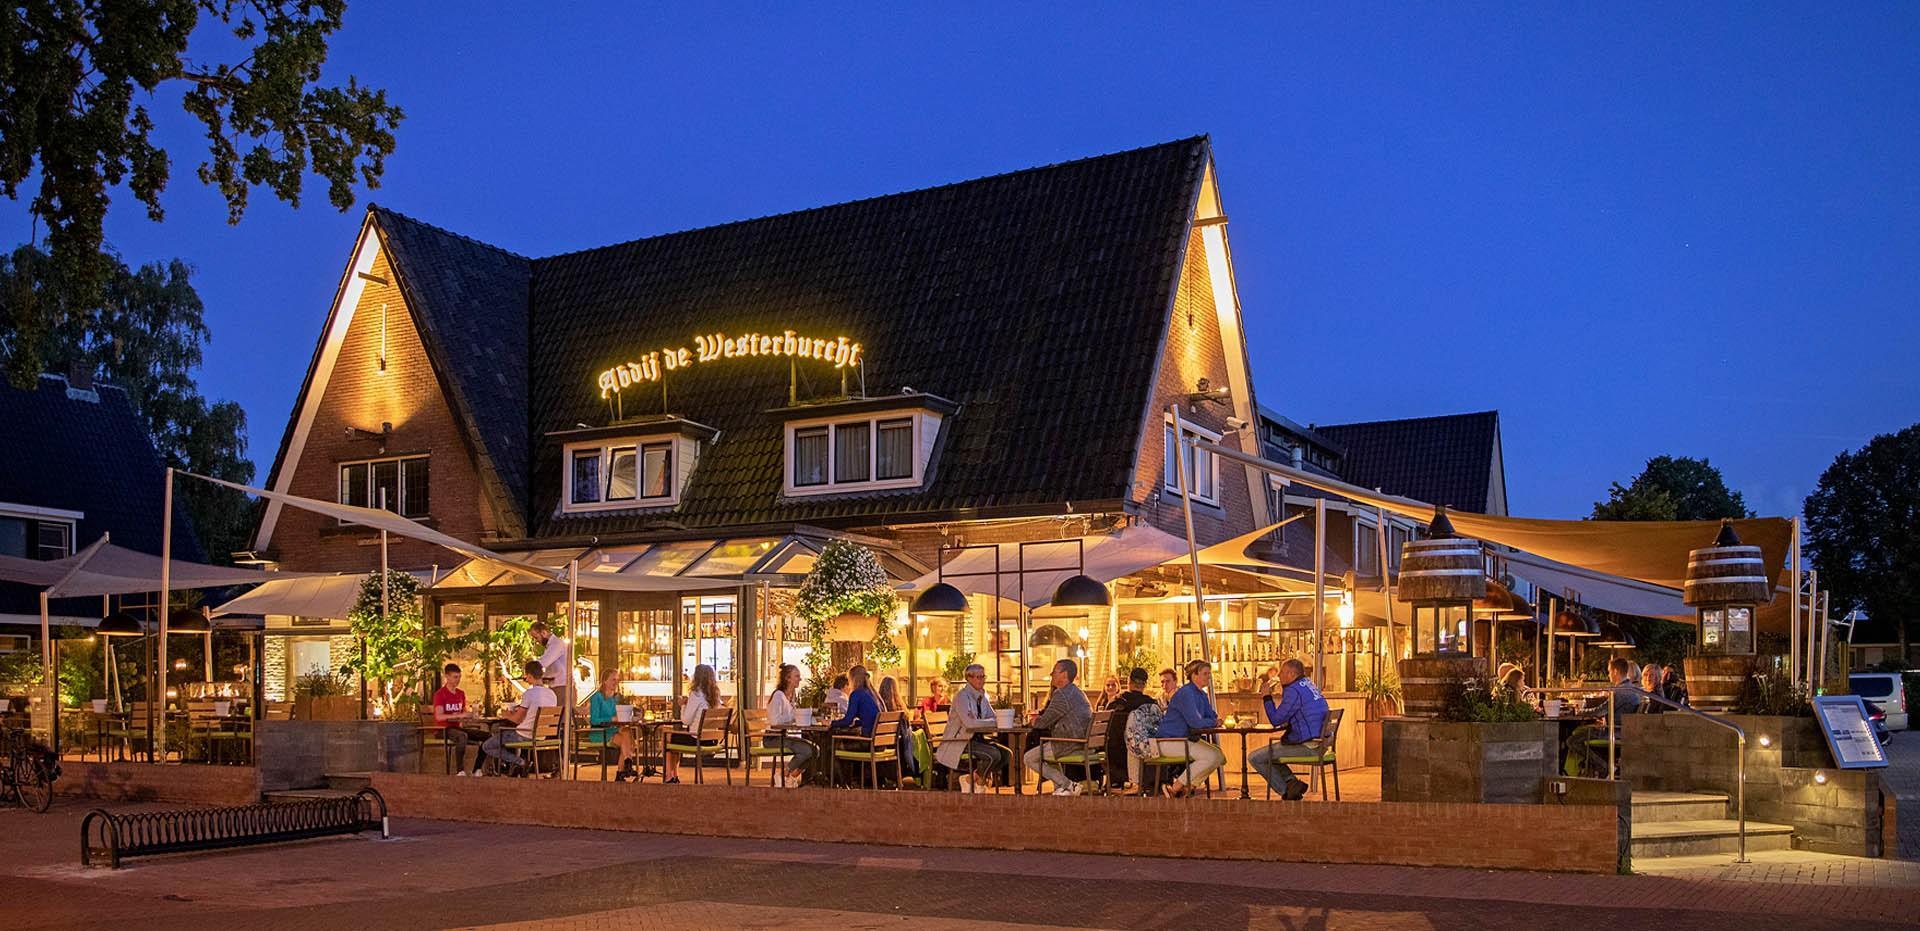 Hotel & Restaurant in Westerbork (Midden-Drenthe)